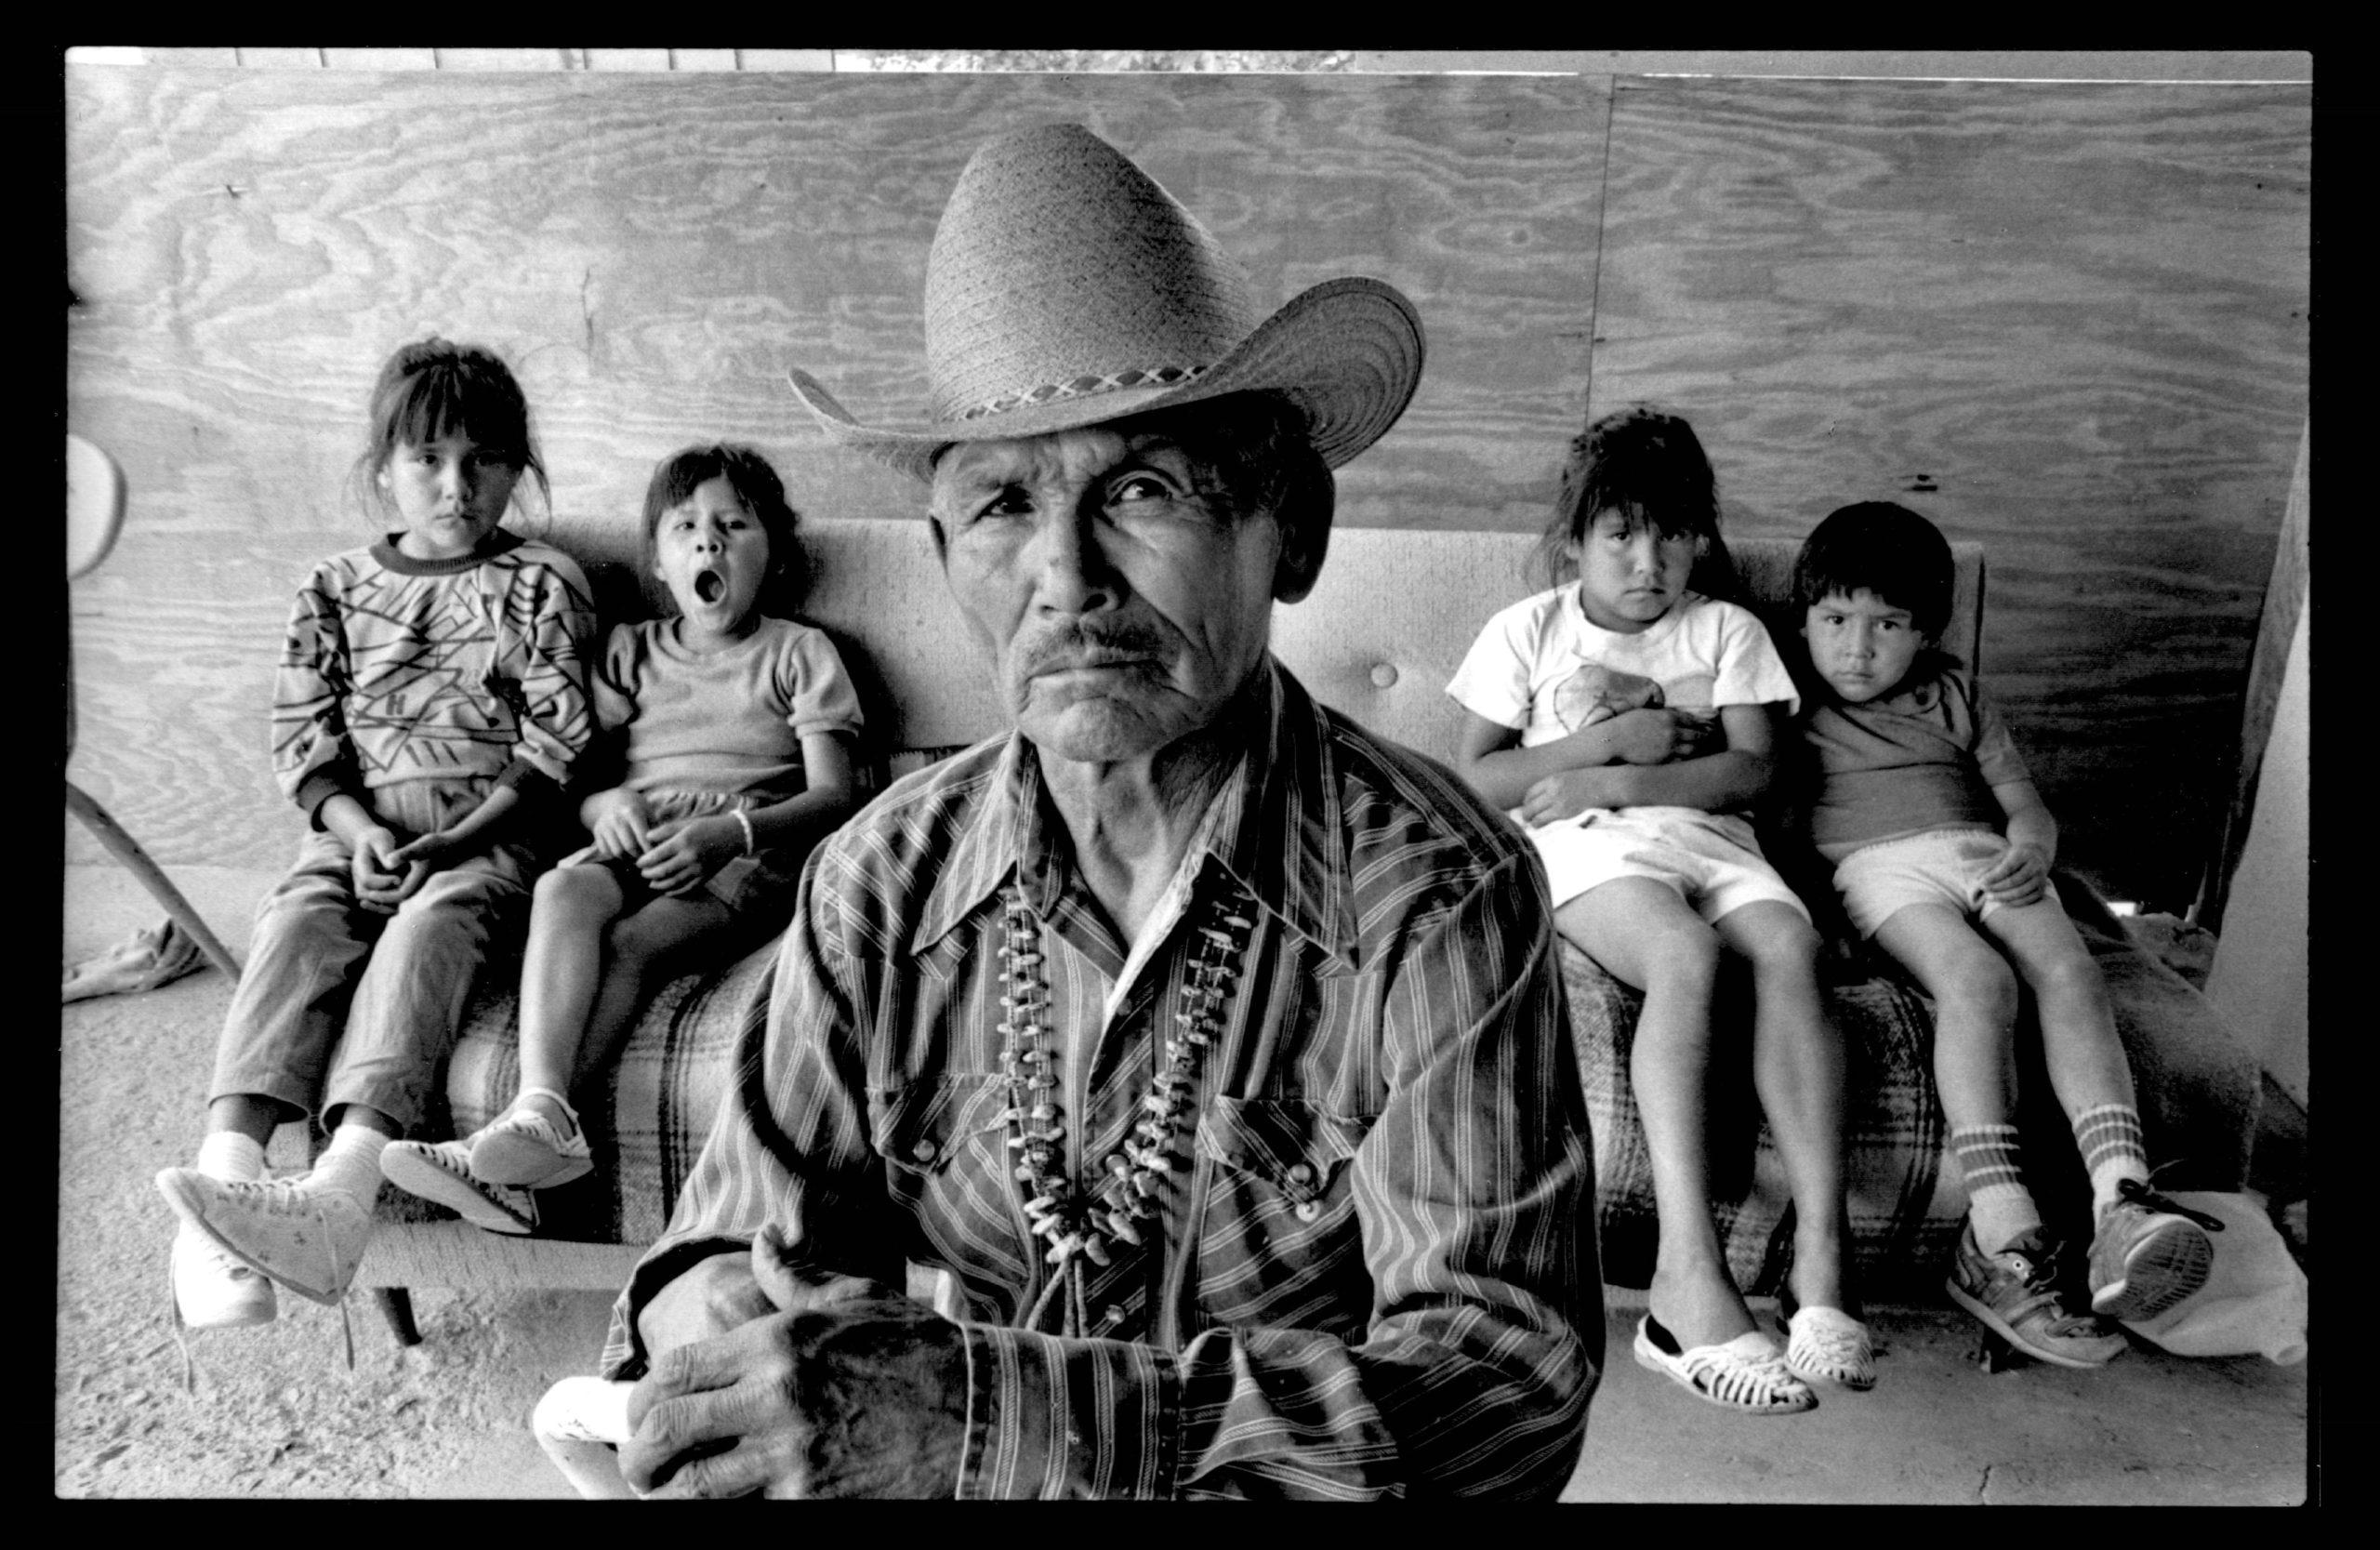 Bennie Arviso, Navajo Code Talker, Smith Lake, New Mexico, 1989.